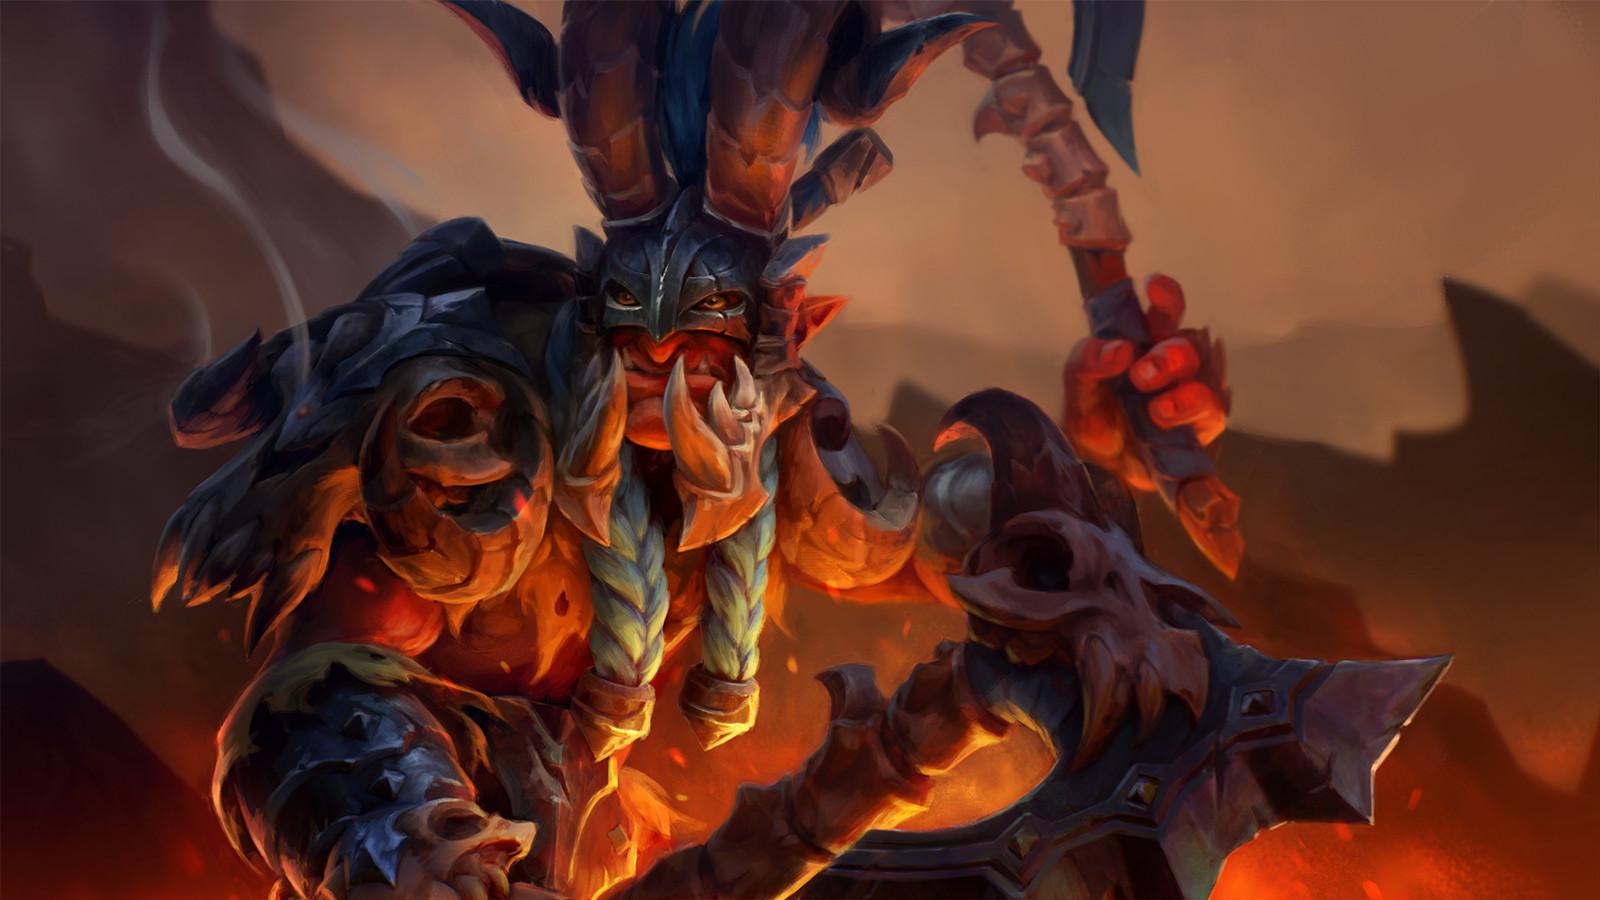 ArtStation Wyvern Bone Battle Armor Troll Warlord Set Kyle Cornelius